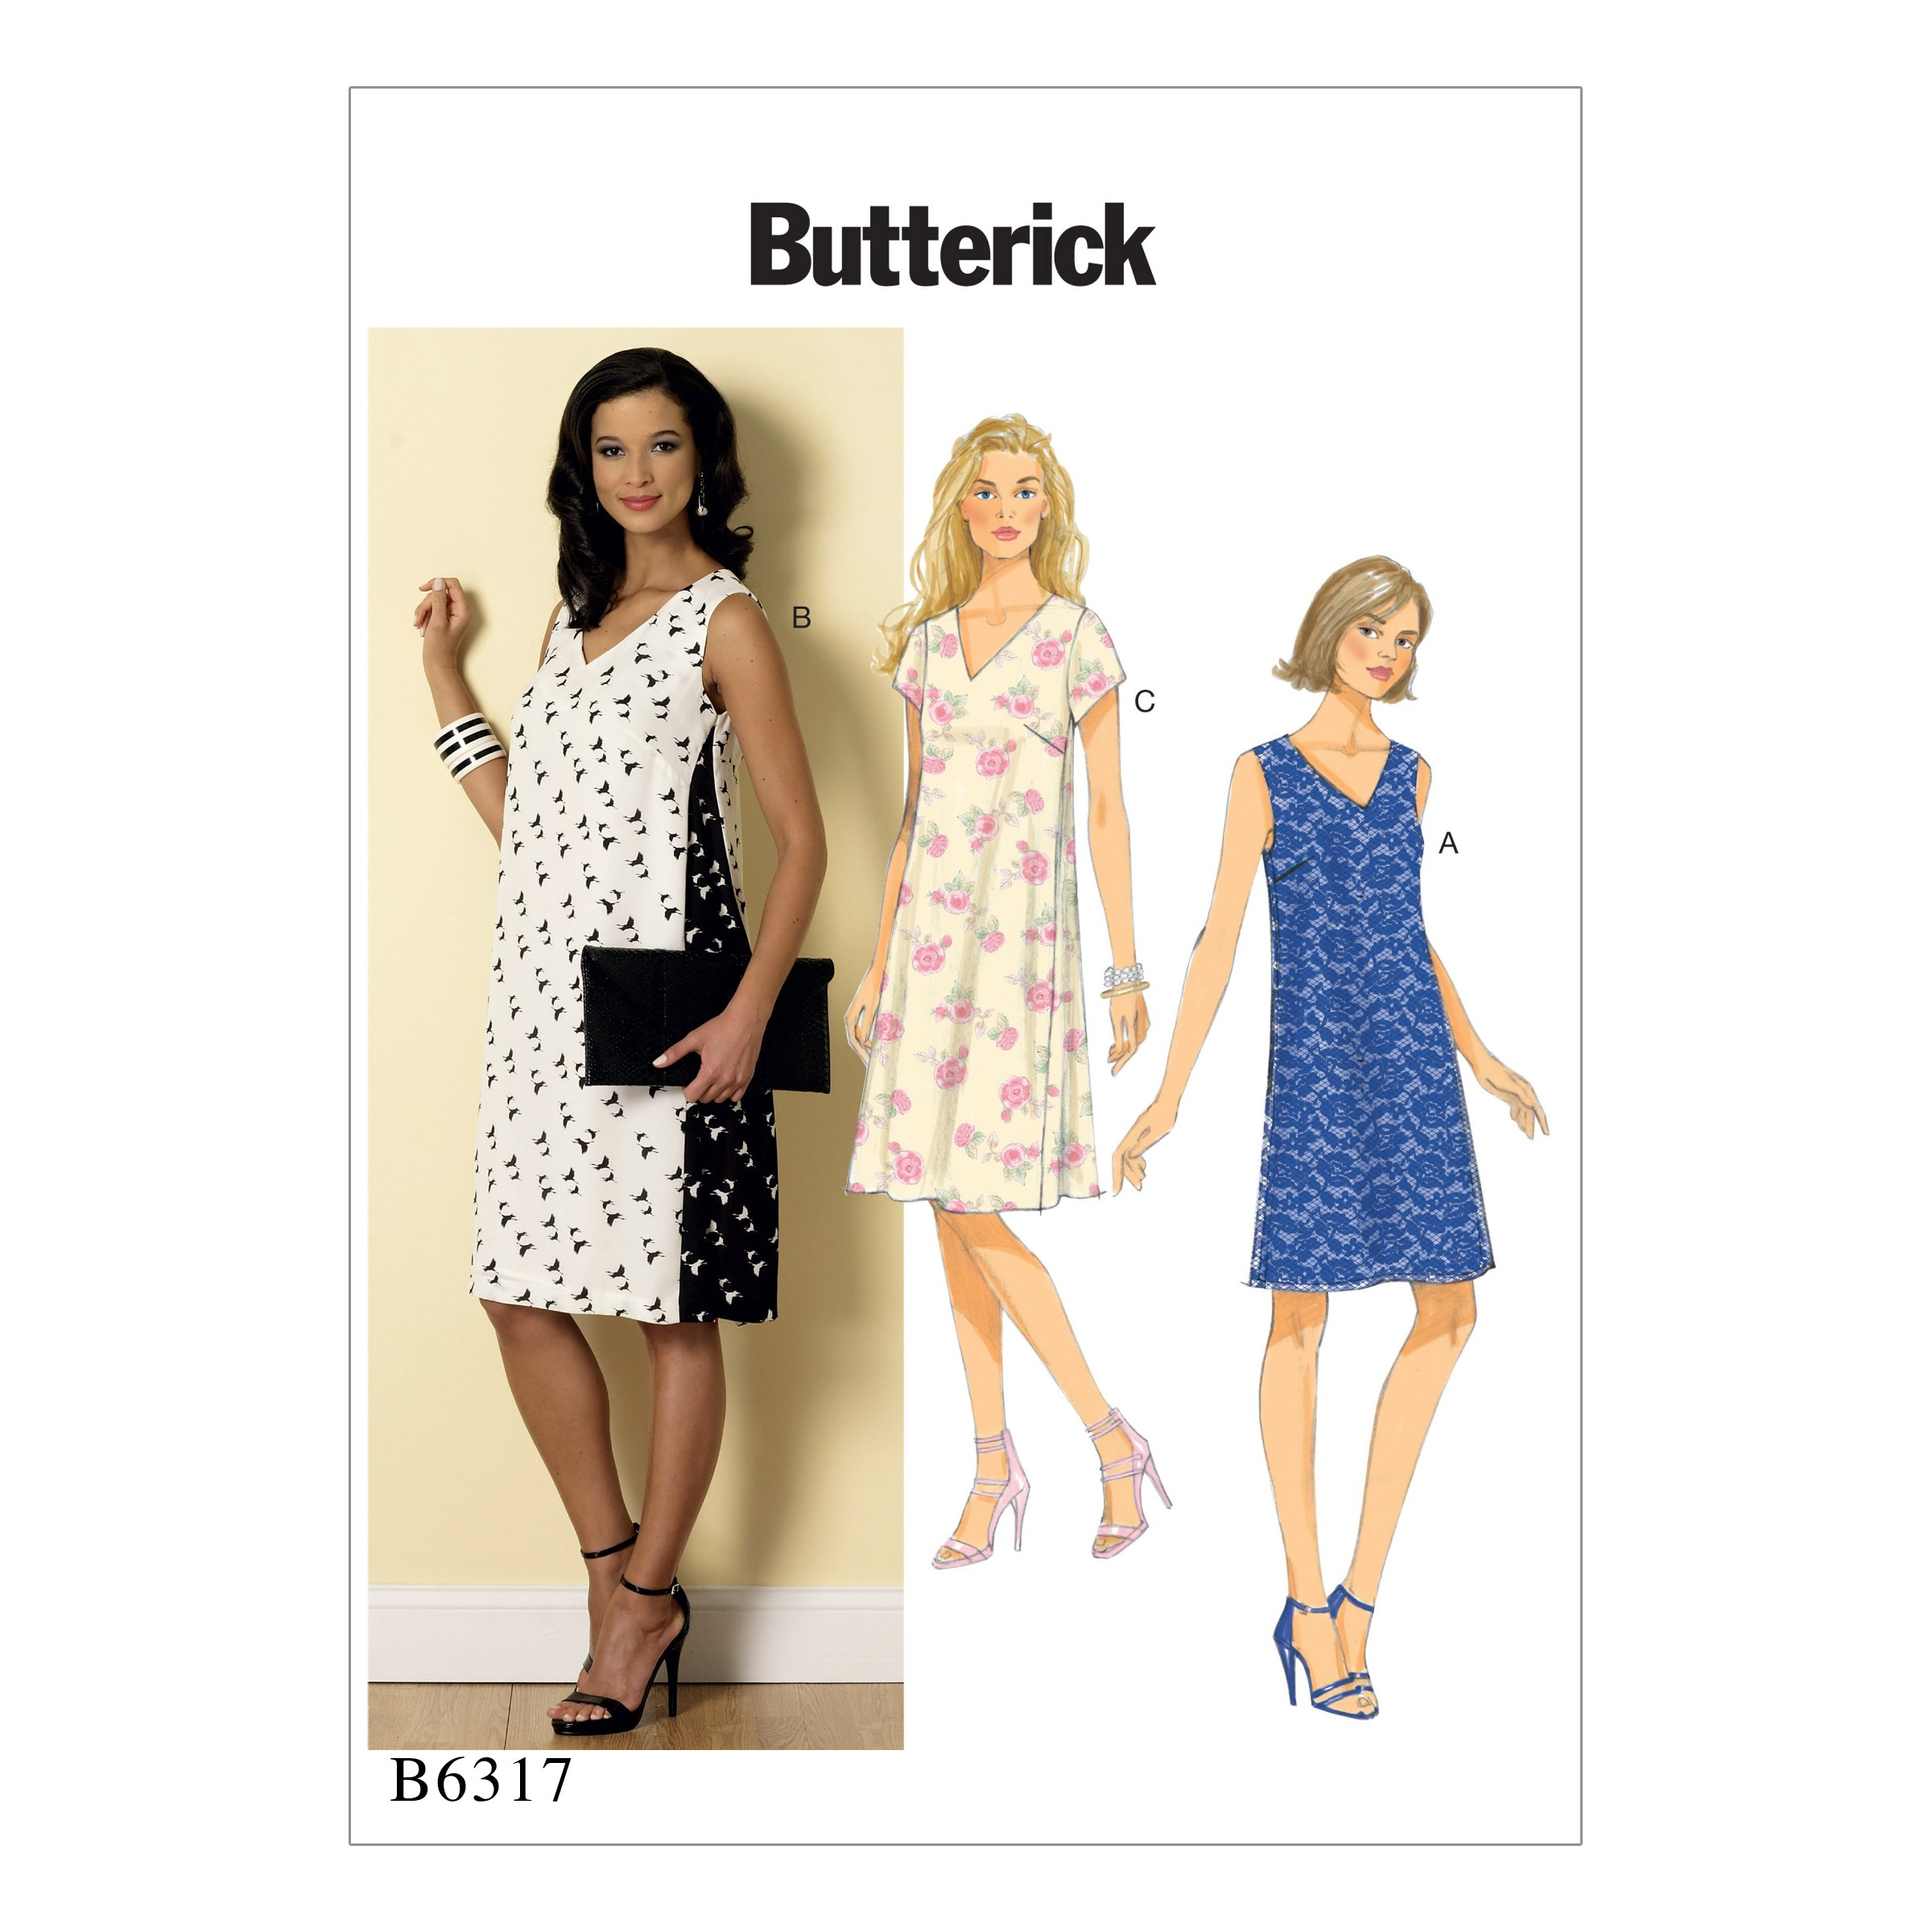 Butterick Sewing Pattern 6317 Misses' Pullover V-Neck Dresses